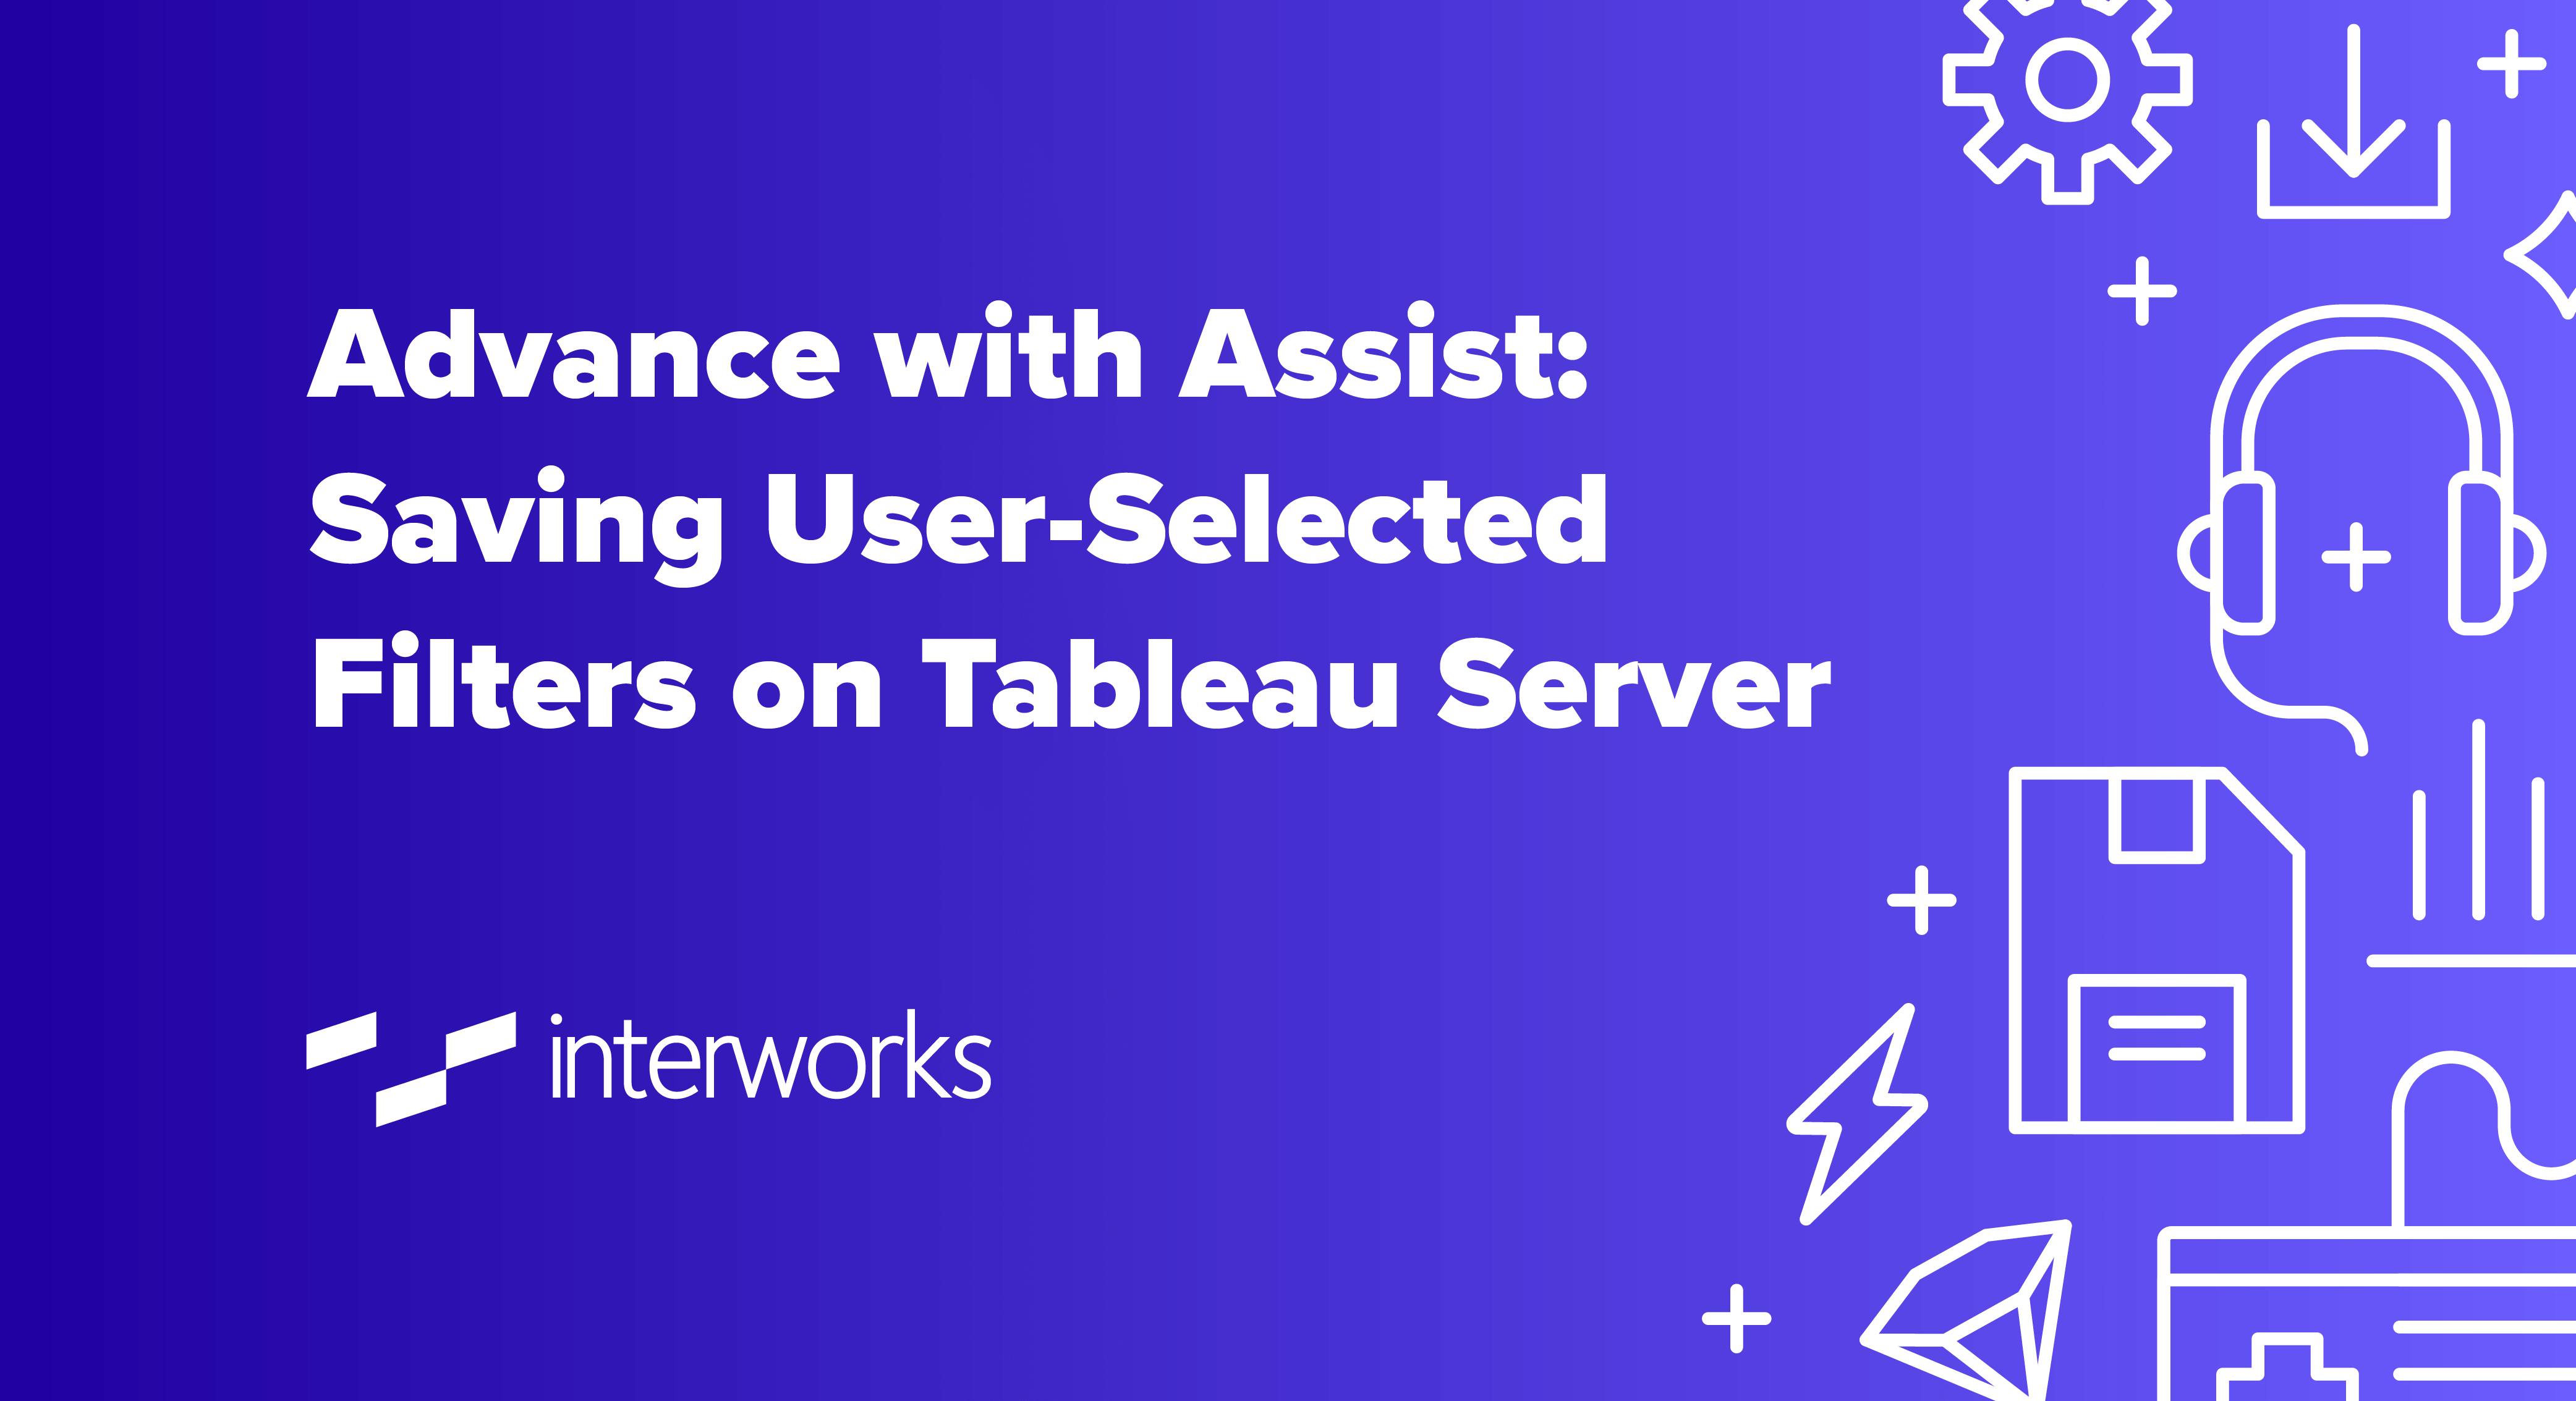 user-selected filters in Tableau Server